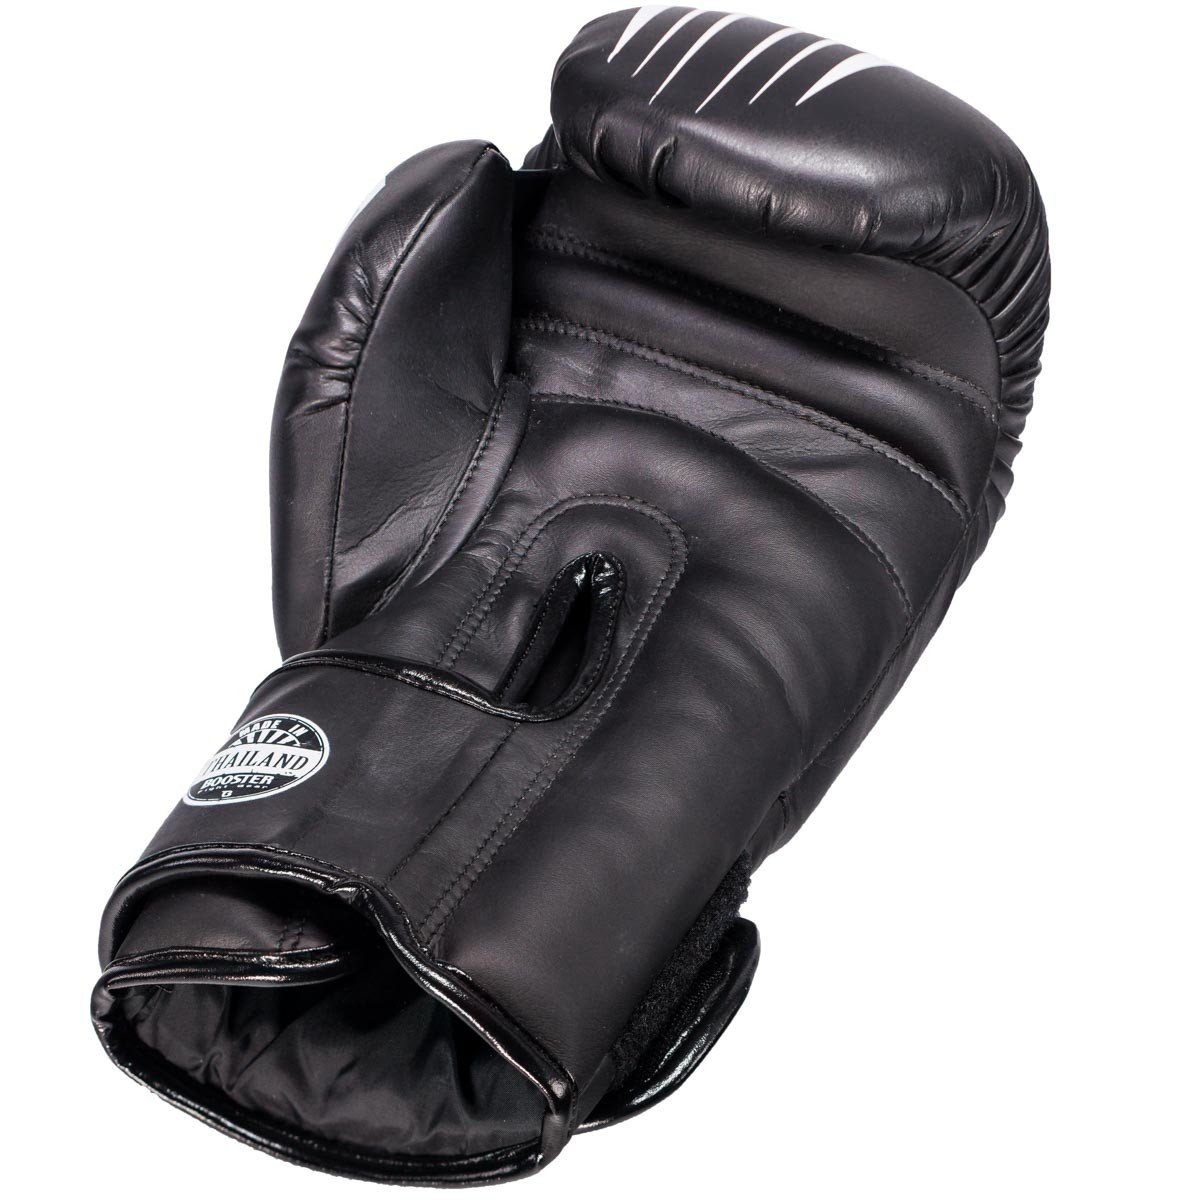 Gants de boxe BGL 1 V7 Noir/Blanc